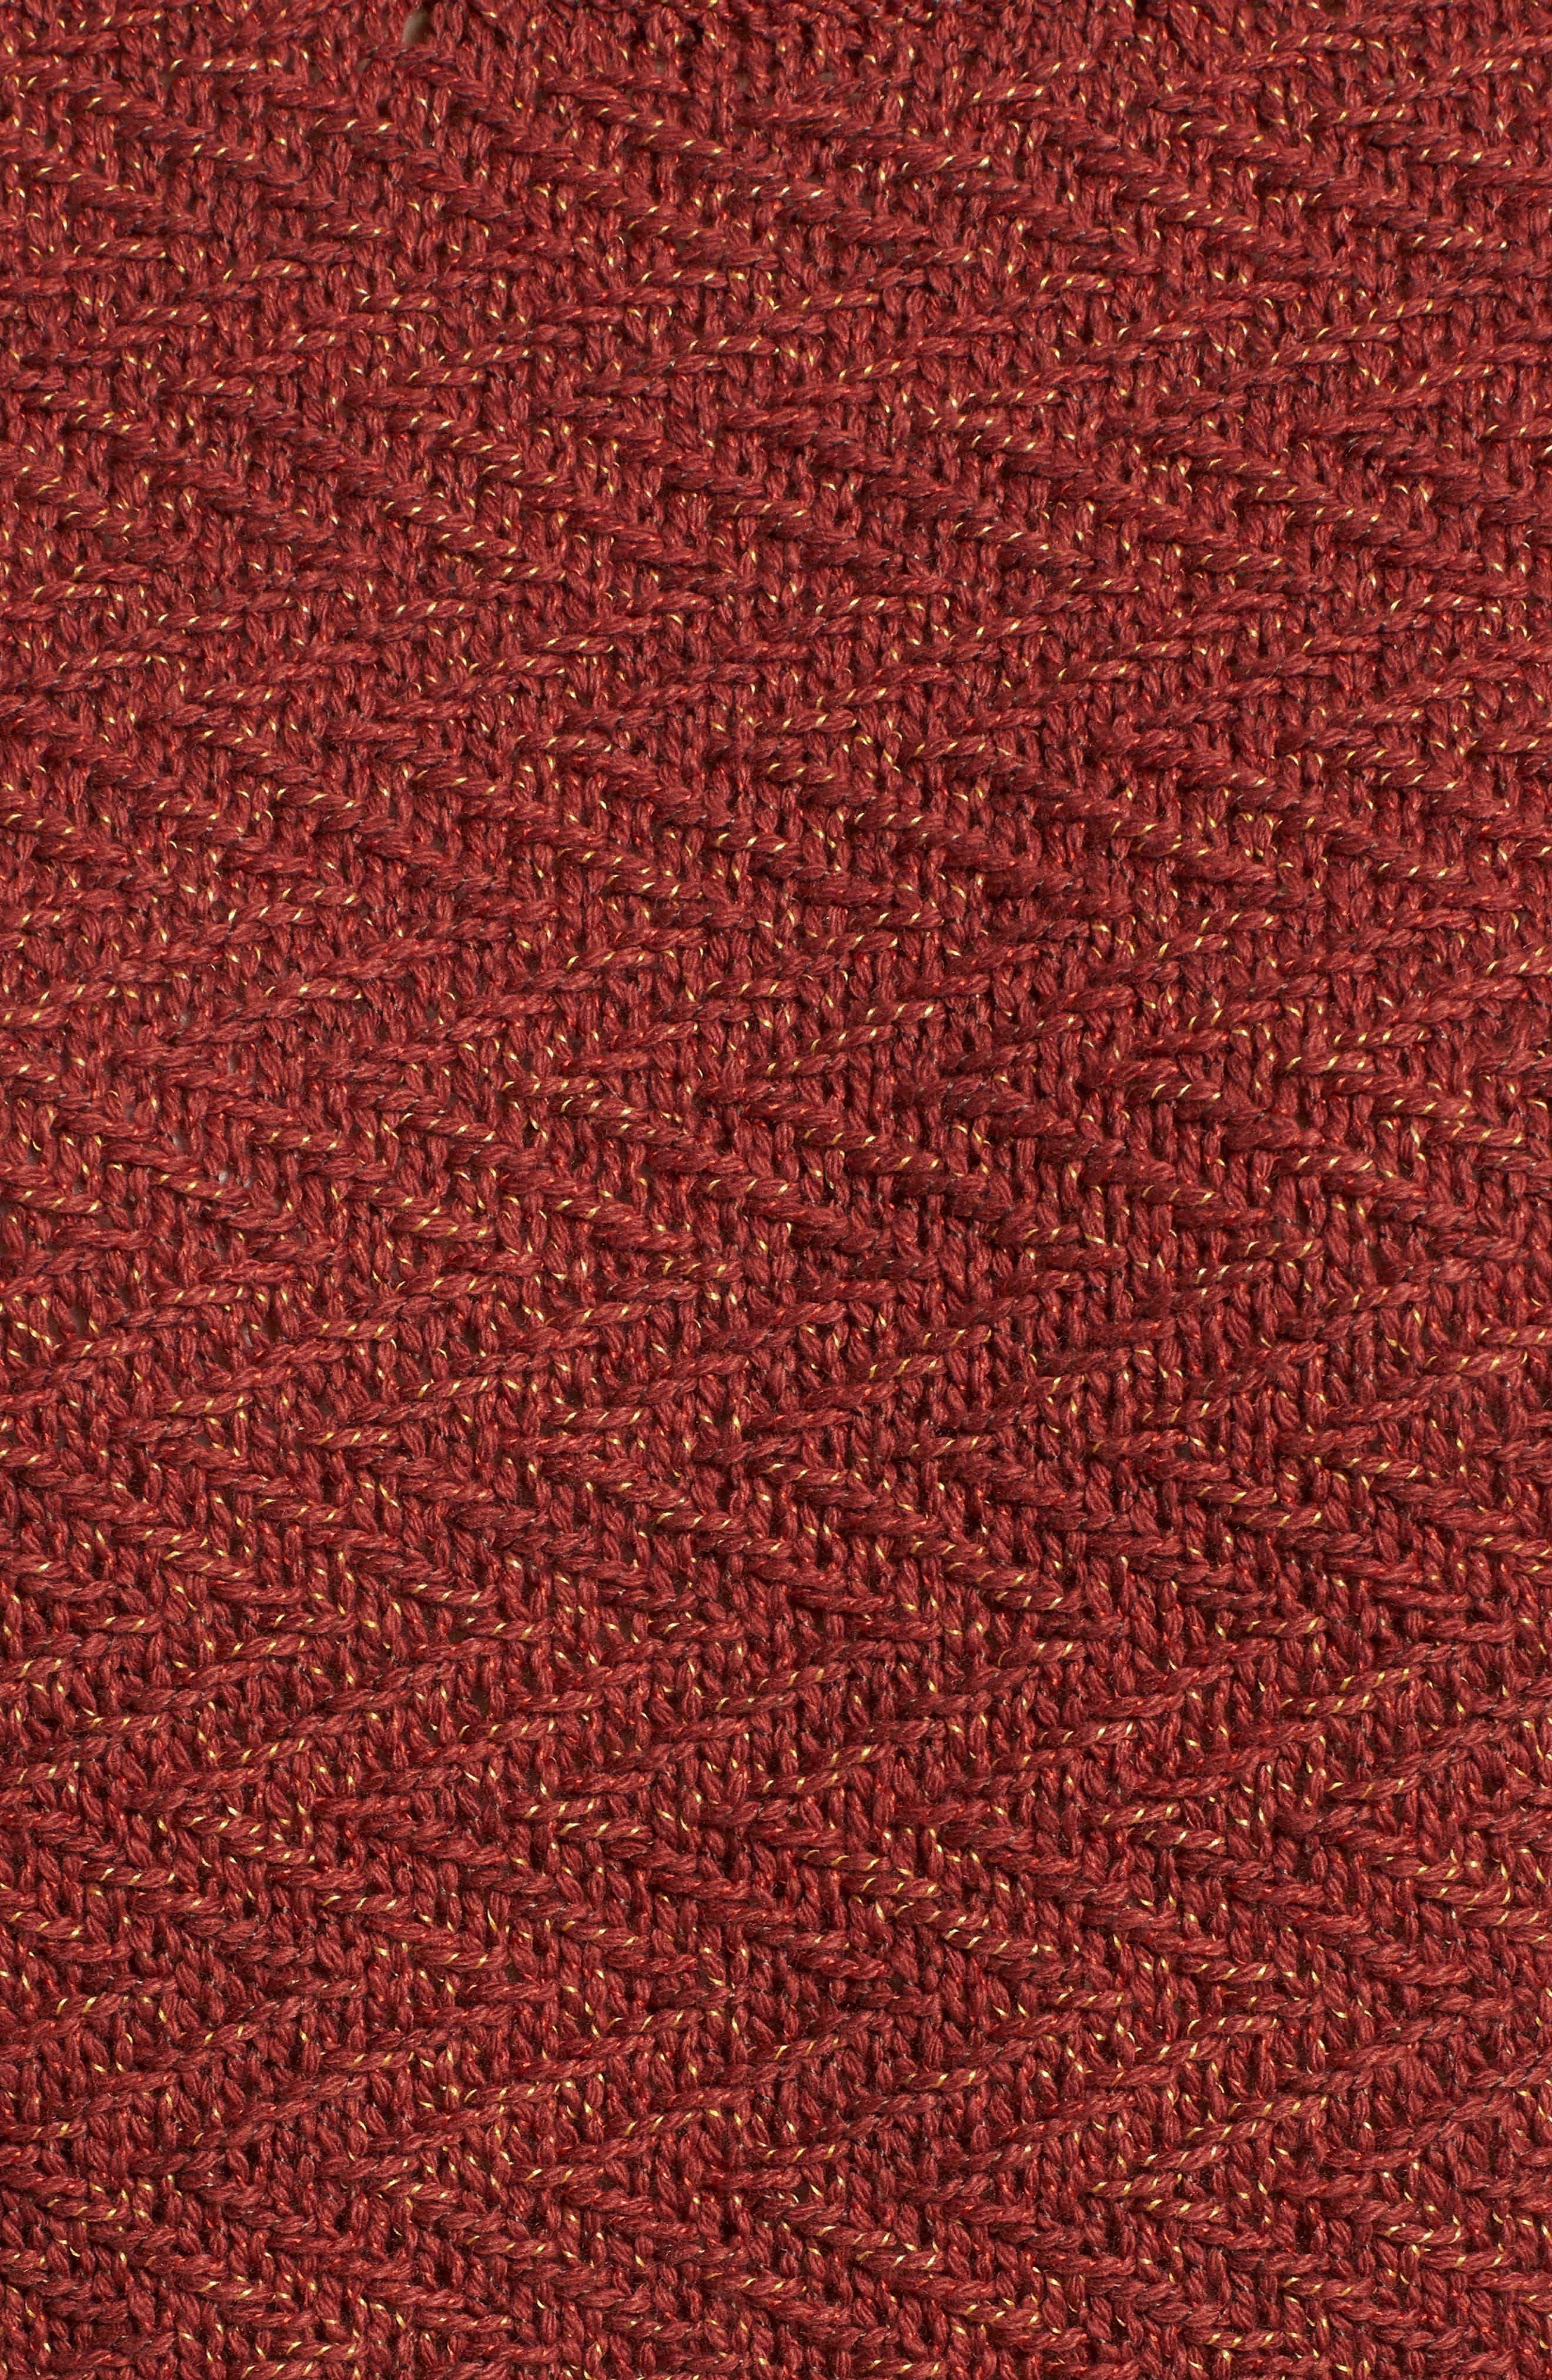 Zigged Sweater,                             Alternate thumbnail 5, color,                             HENNA